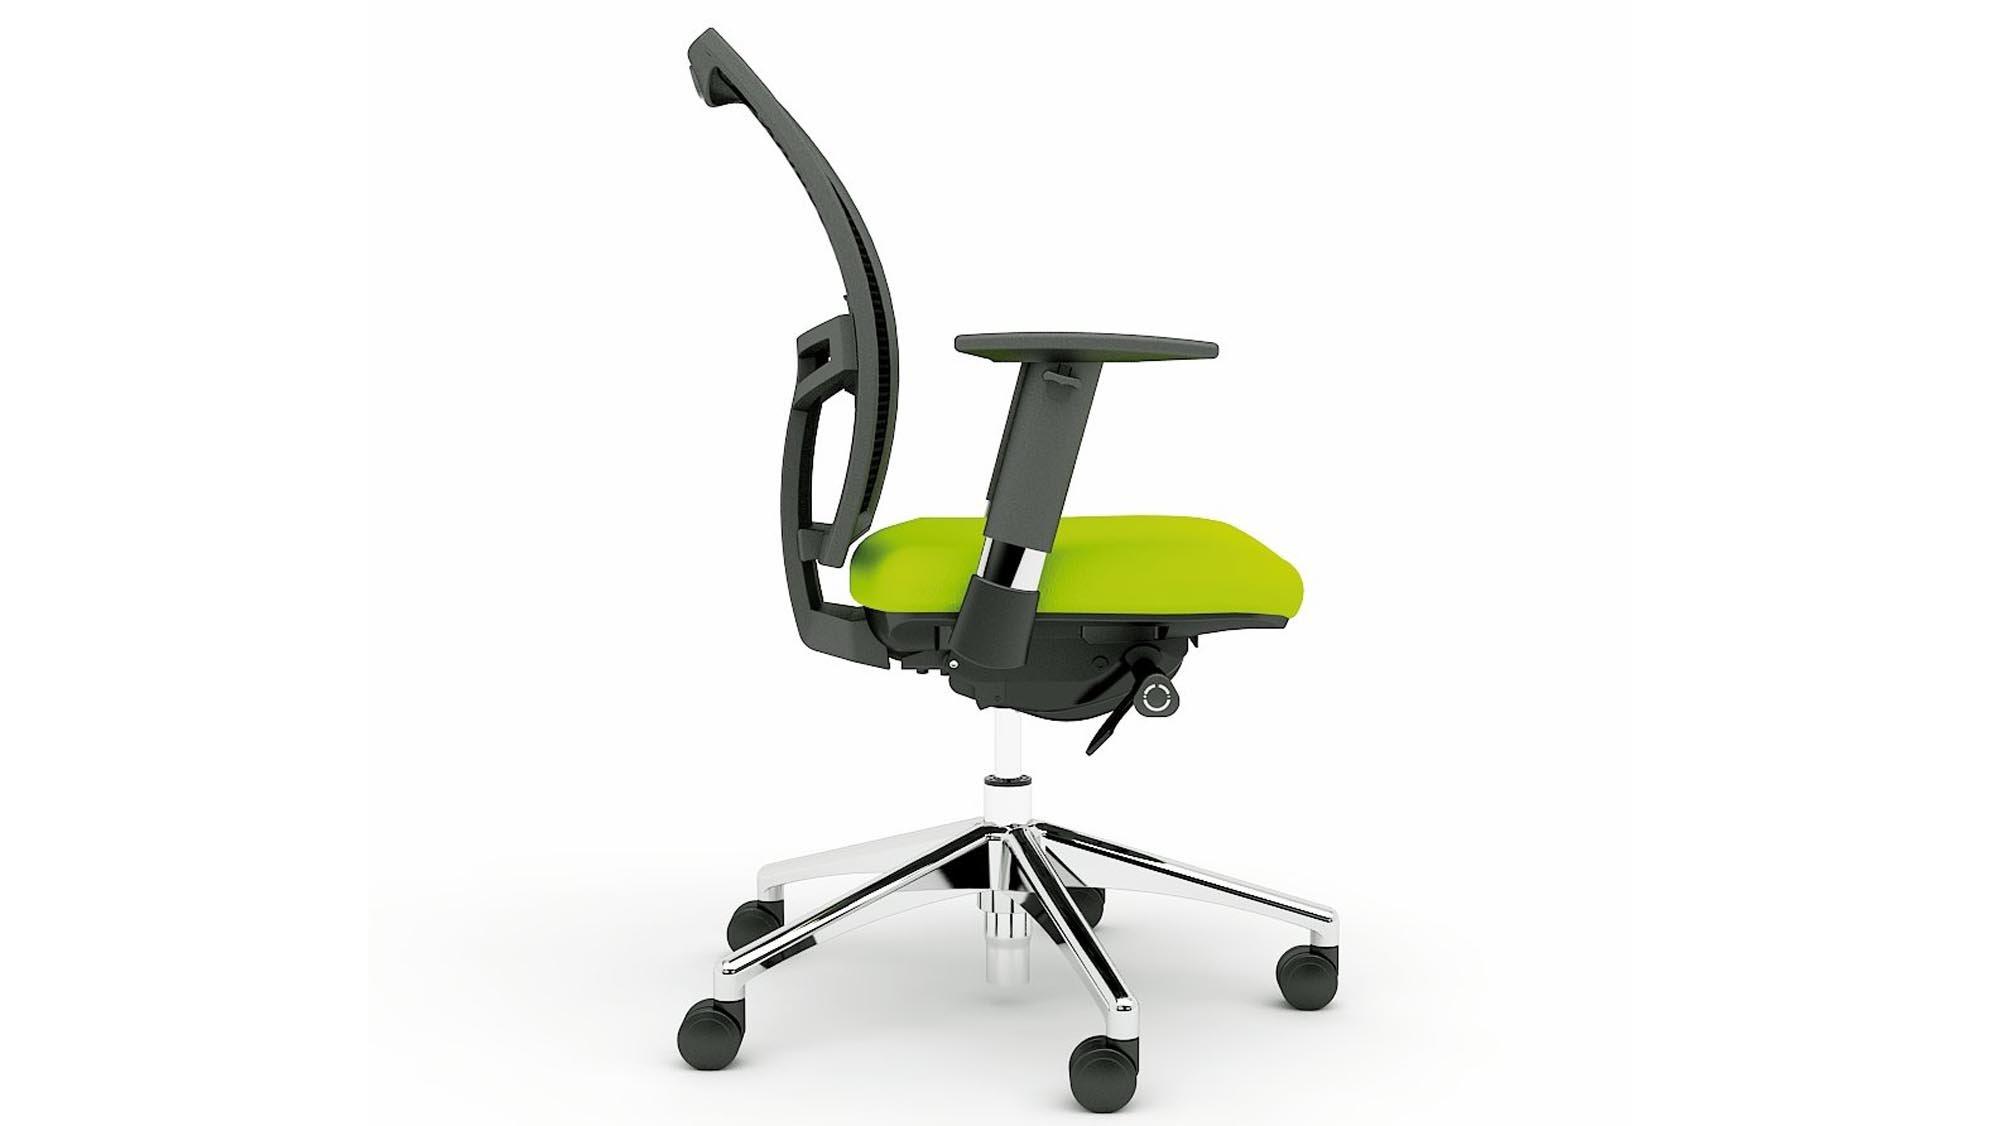 Best value desk chair